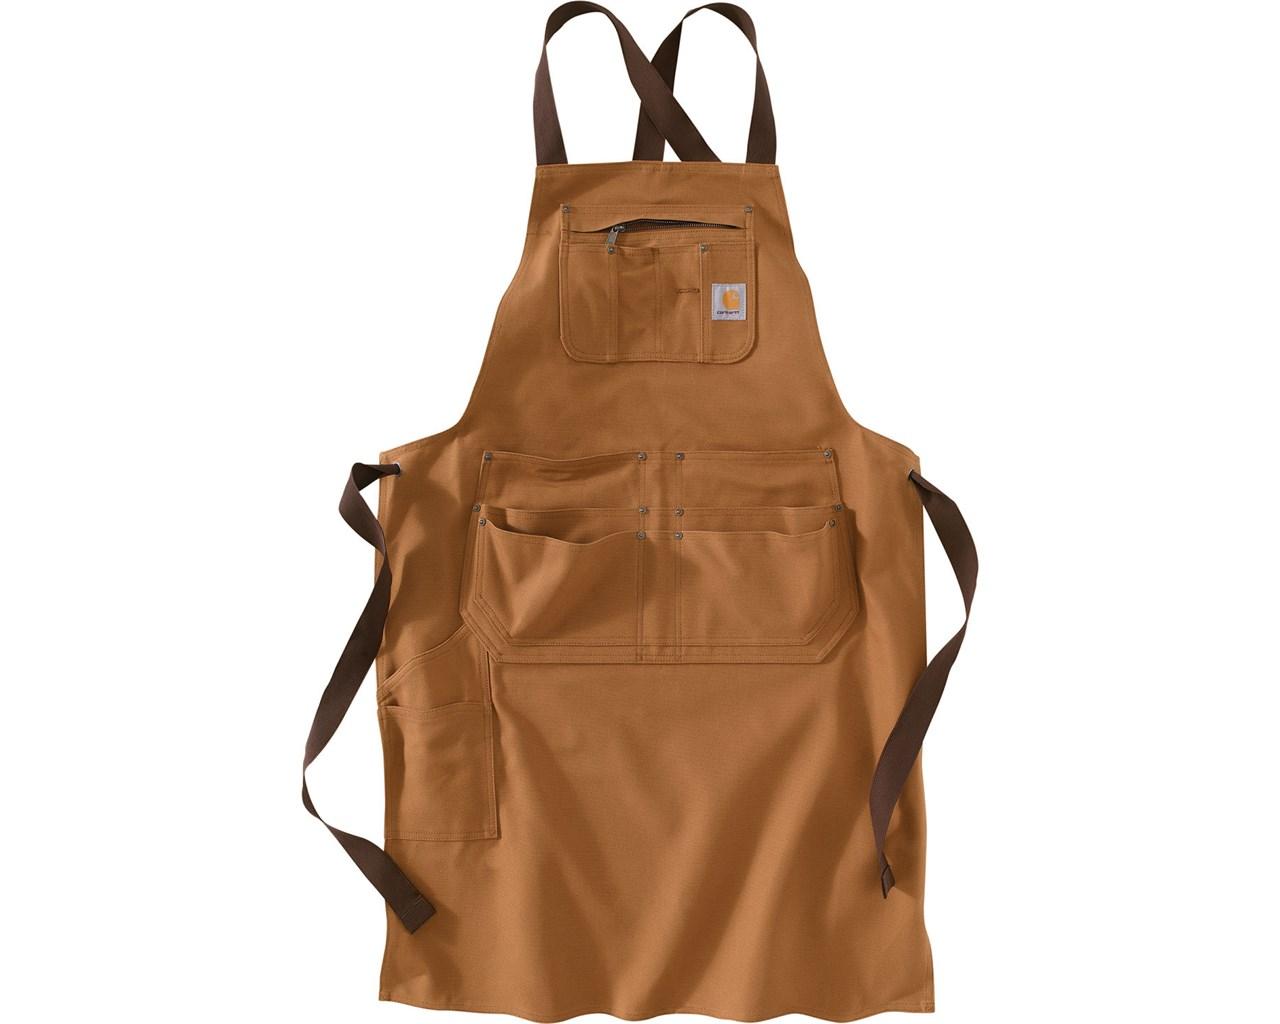 carhartt-apron-102483-mammothworkwearcom.jpg